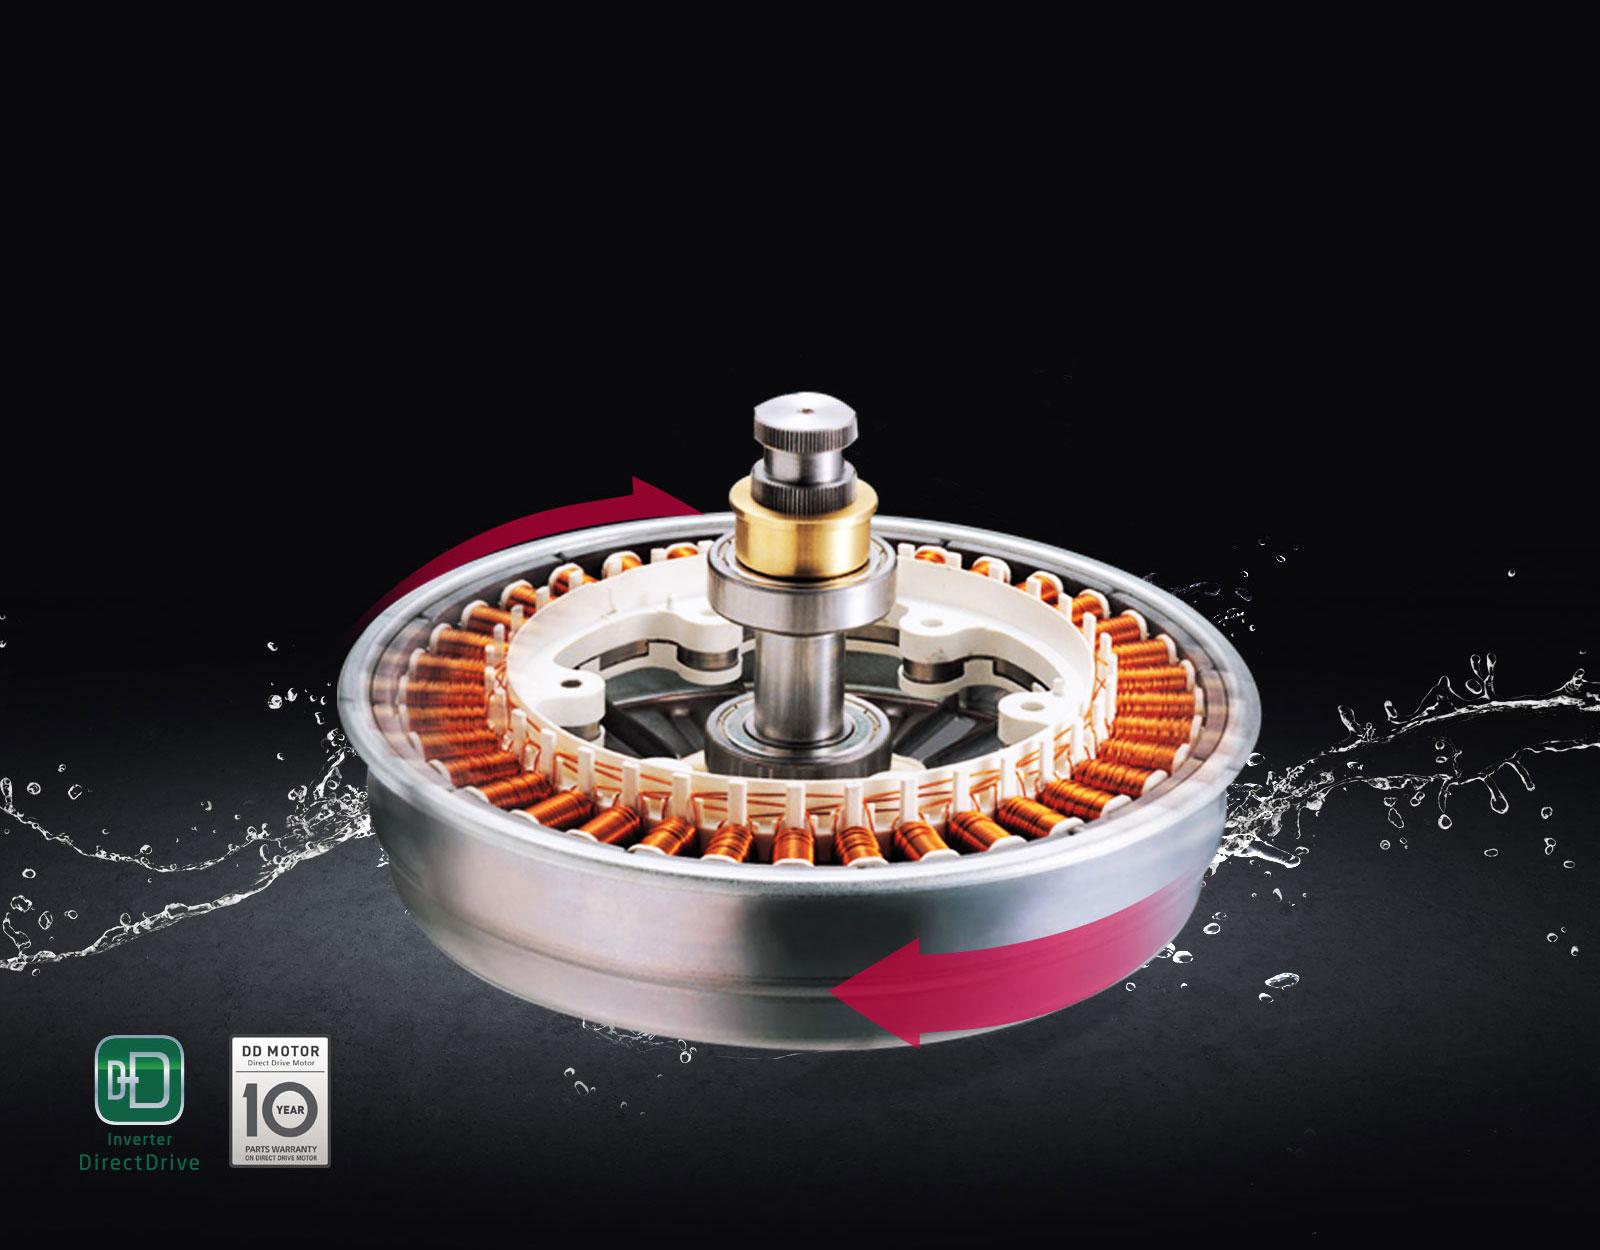 Inverter Direct Drive Motor1